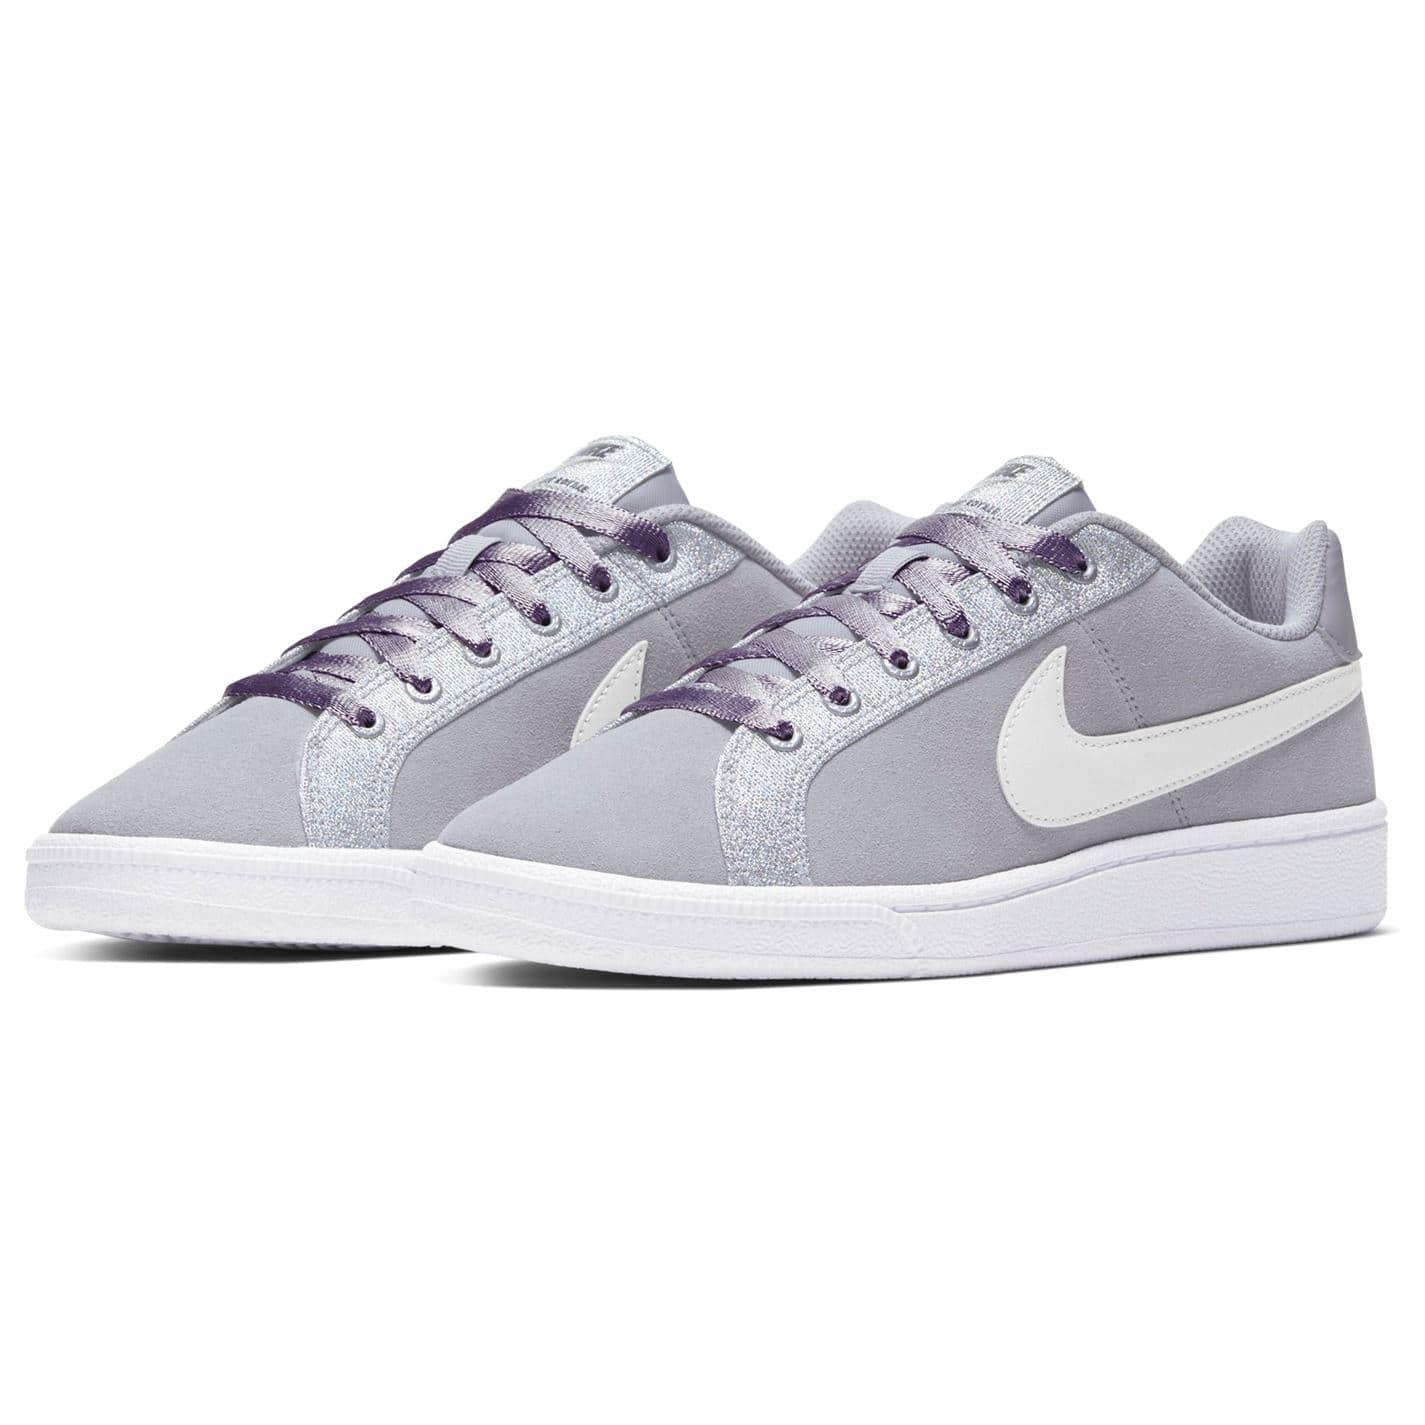 Nike Court Royale Premium Ladies Trainers